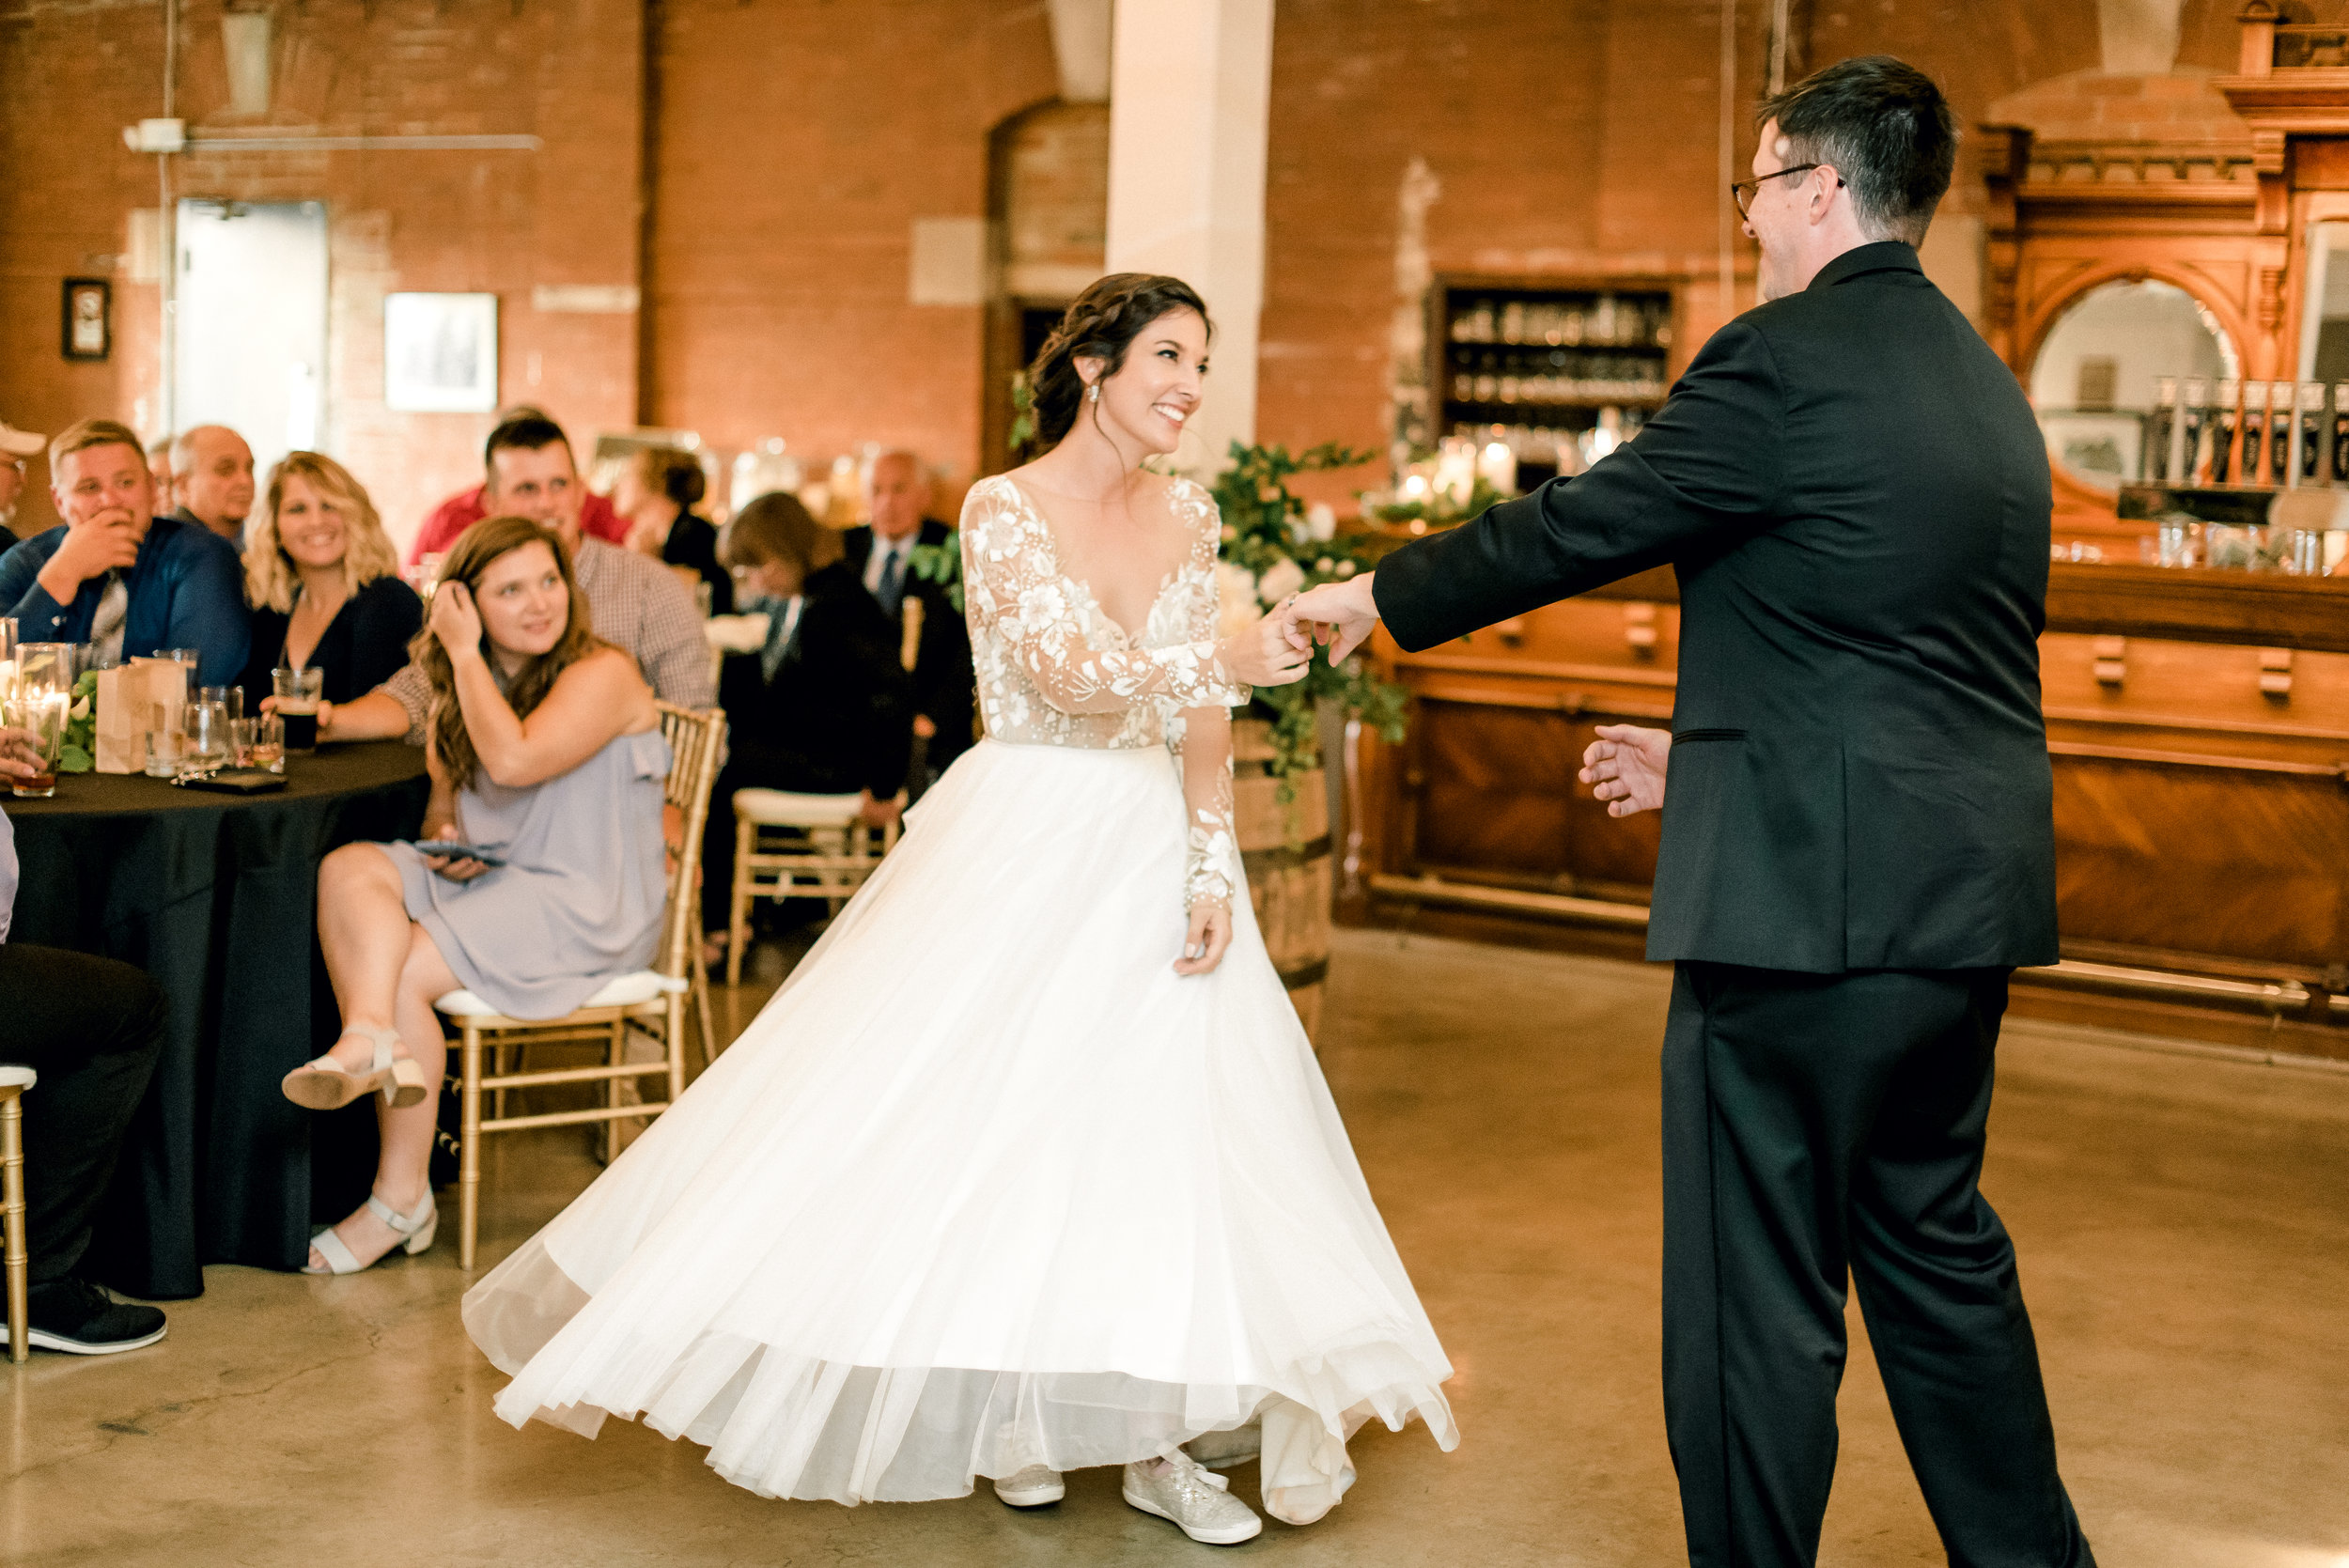 cleveland-wedding-photographer-great-lakes-brewing-arcade-0070.jpg